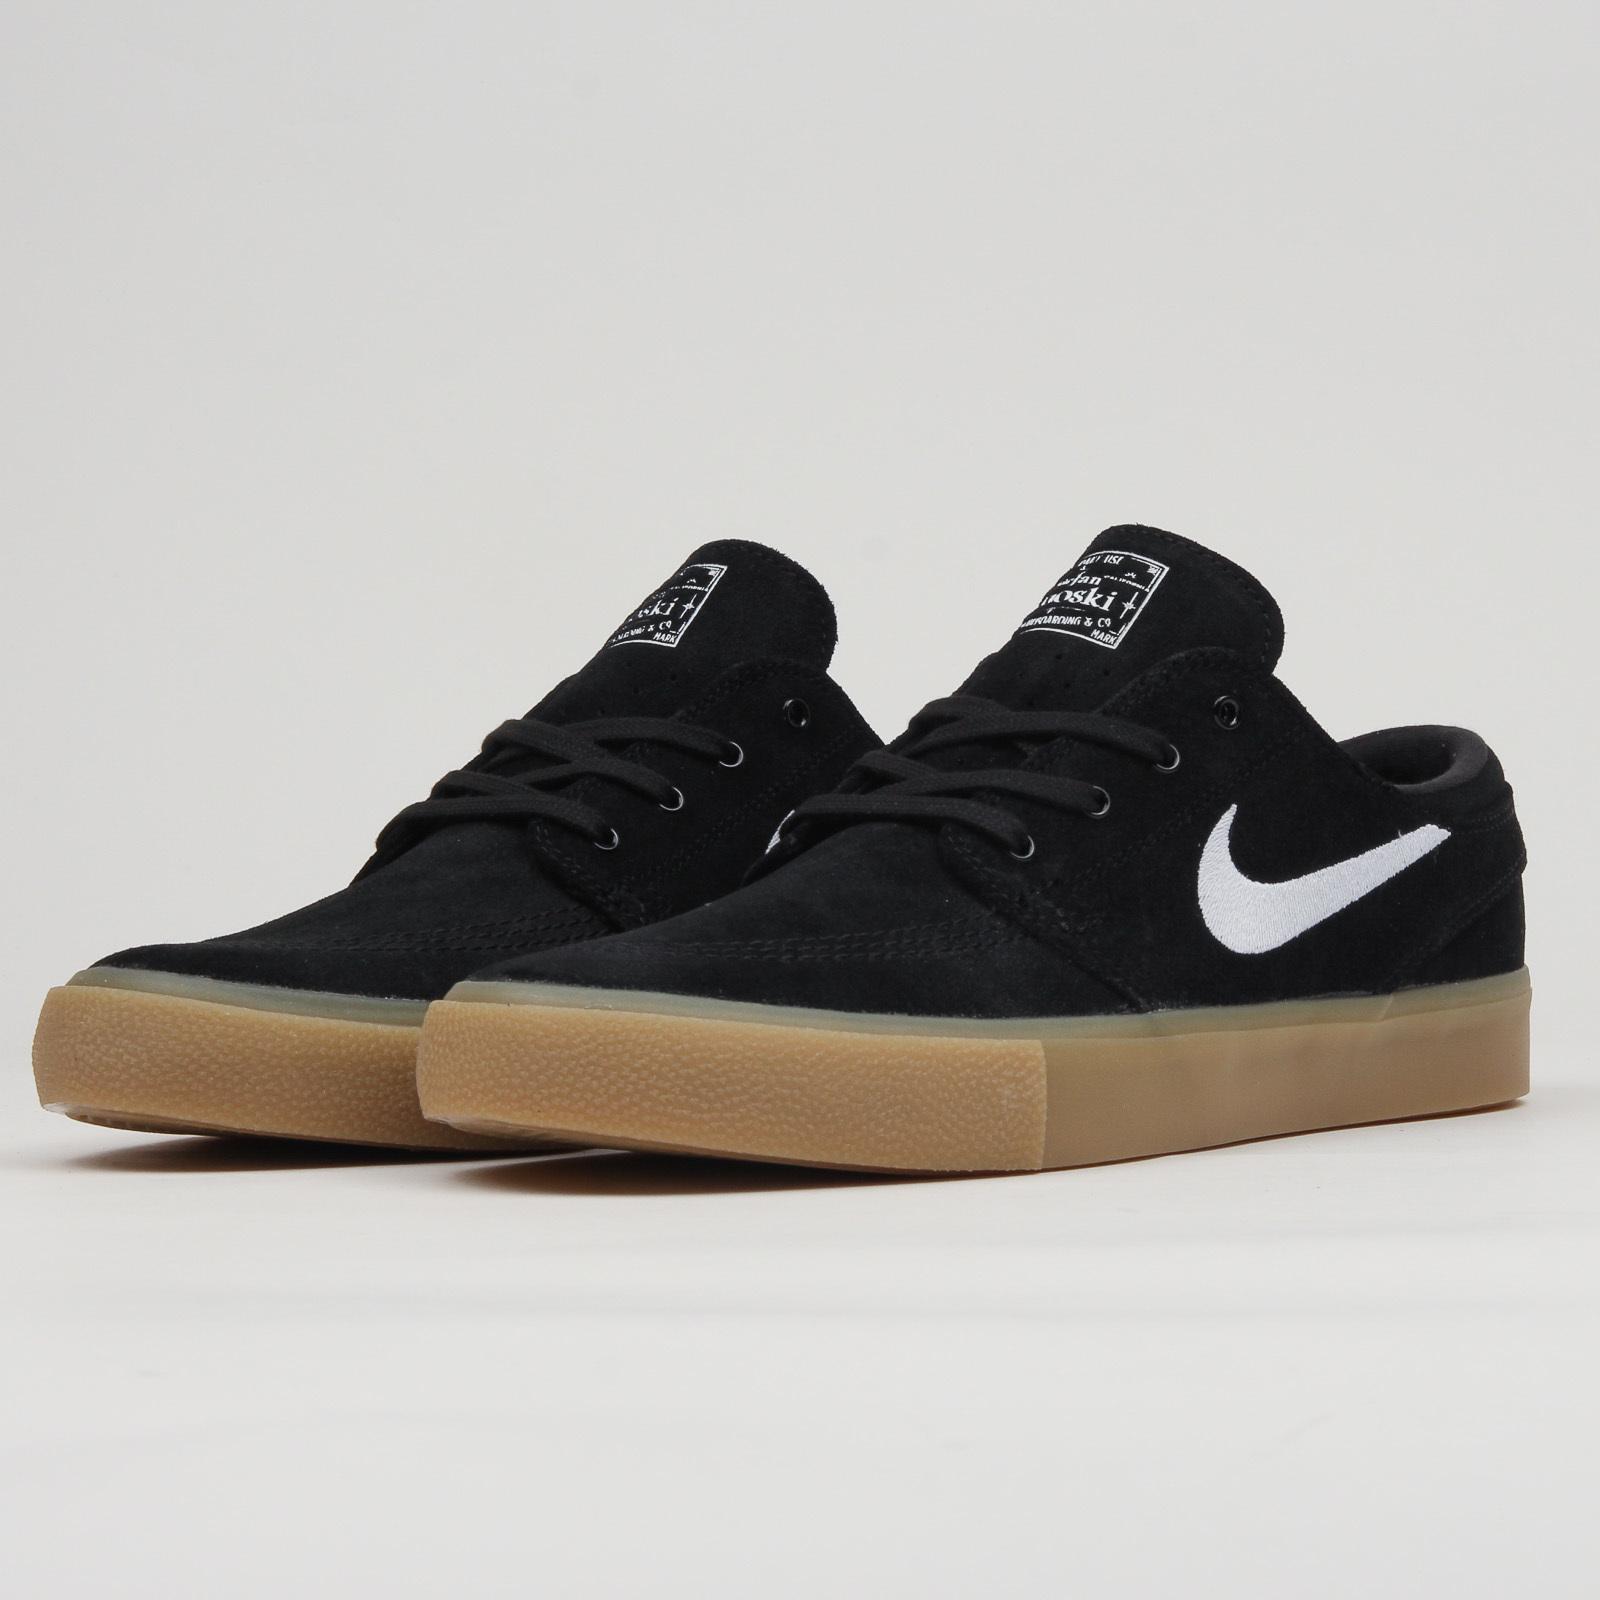 0f51c3952f Nike SB Zoom Janoski RM black   white - black - Glami.cz